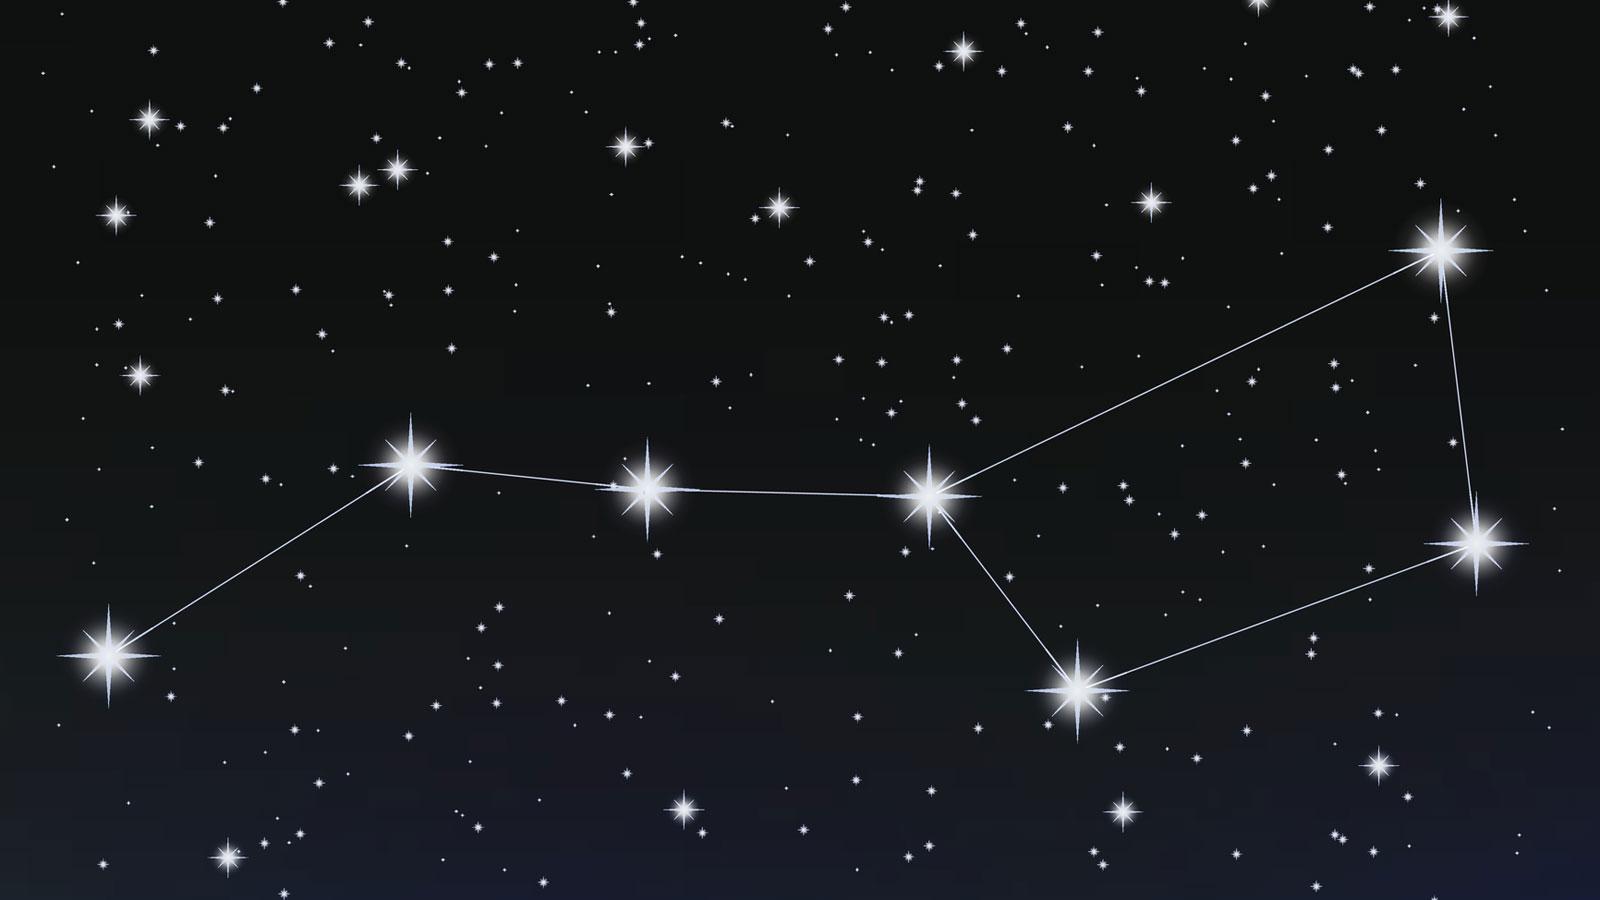 Sternbilder Erkennen App